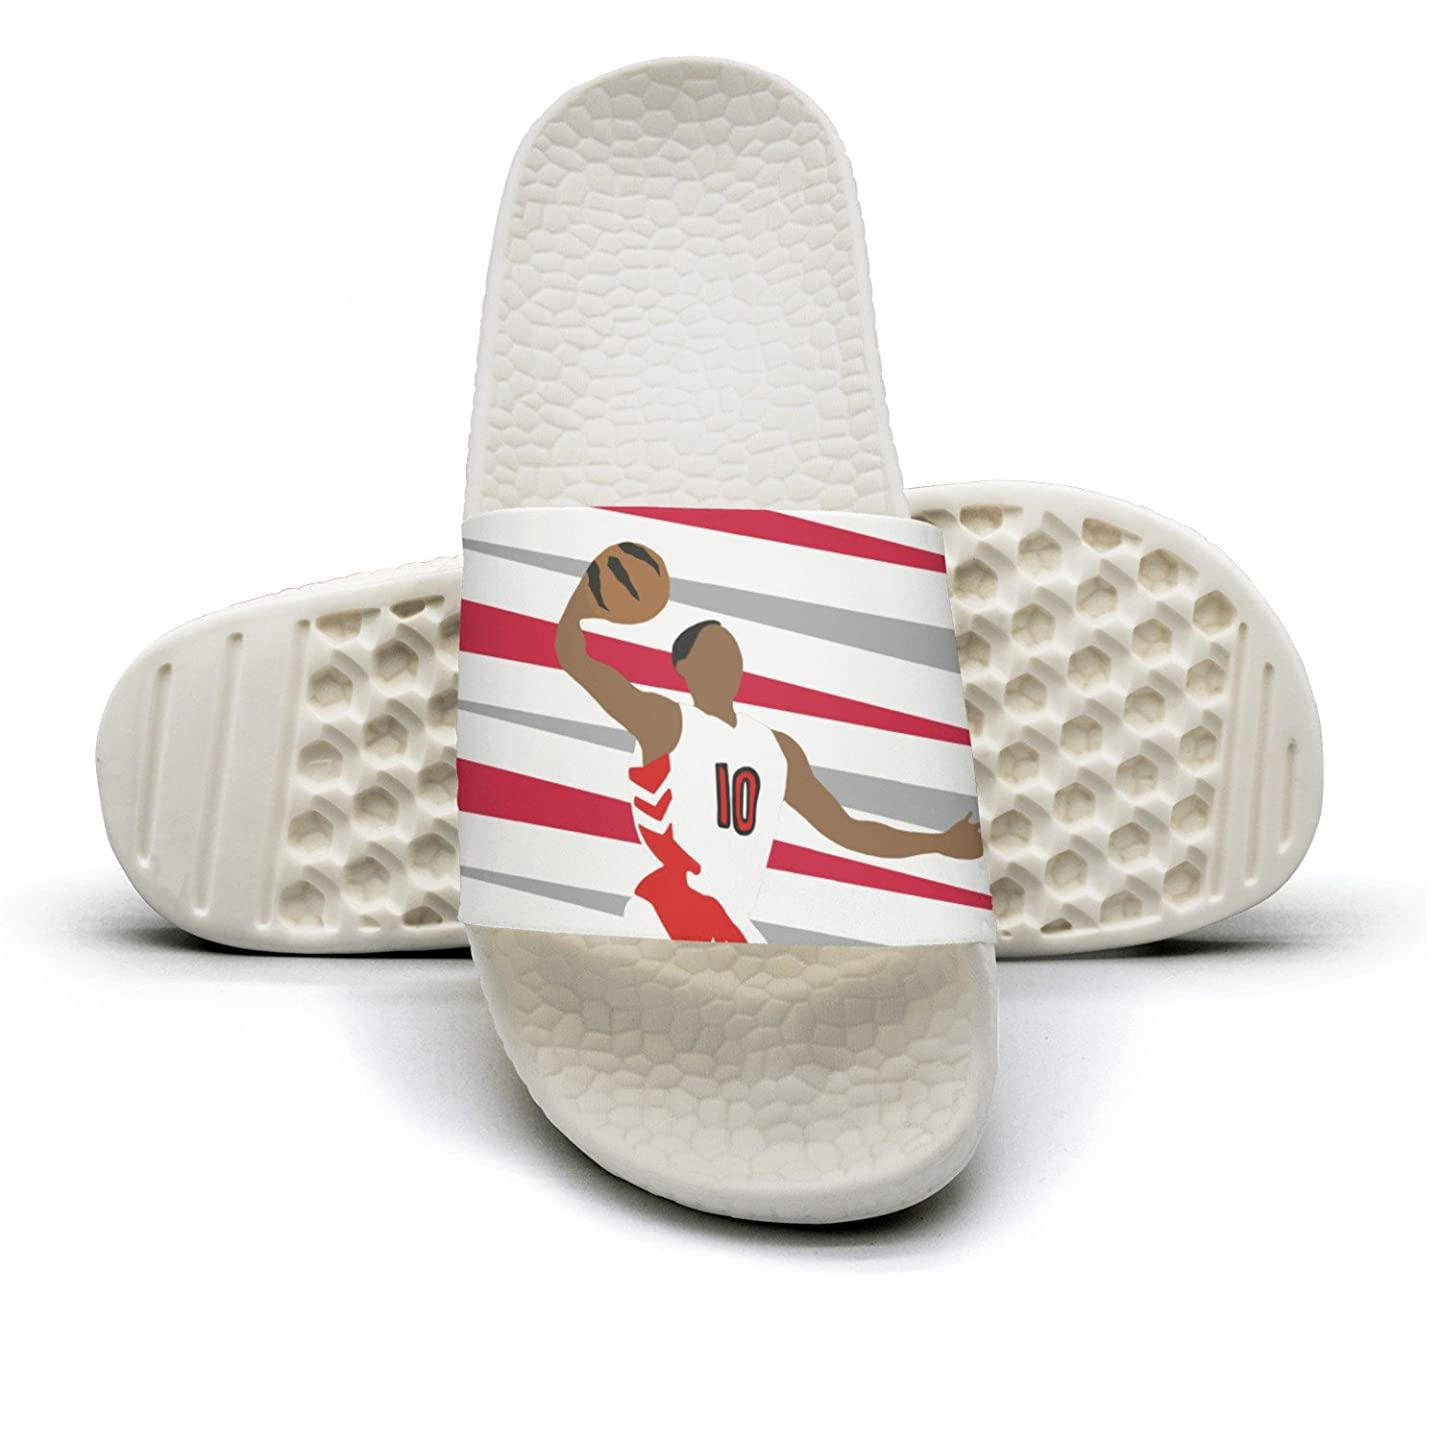 California Basketball Team Player Non-Slip Outdoor Sandals Flip Flops For Women